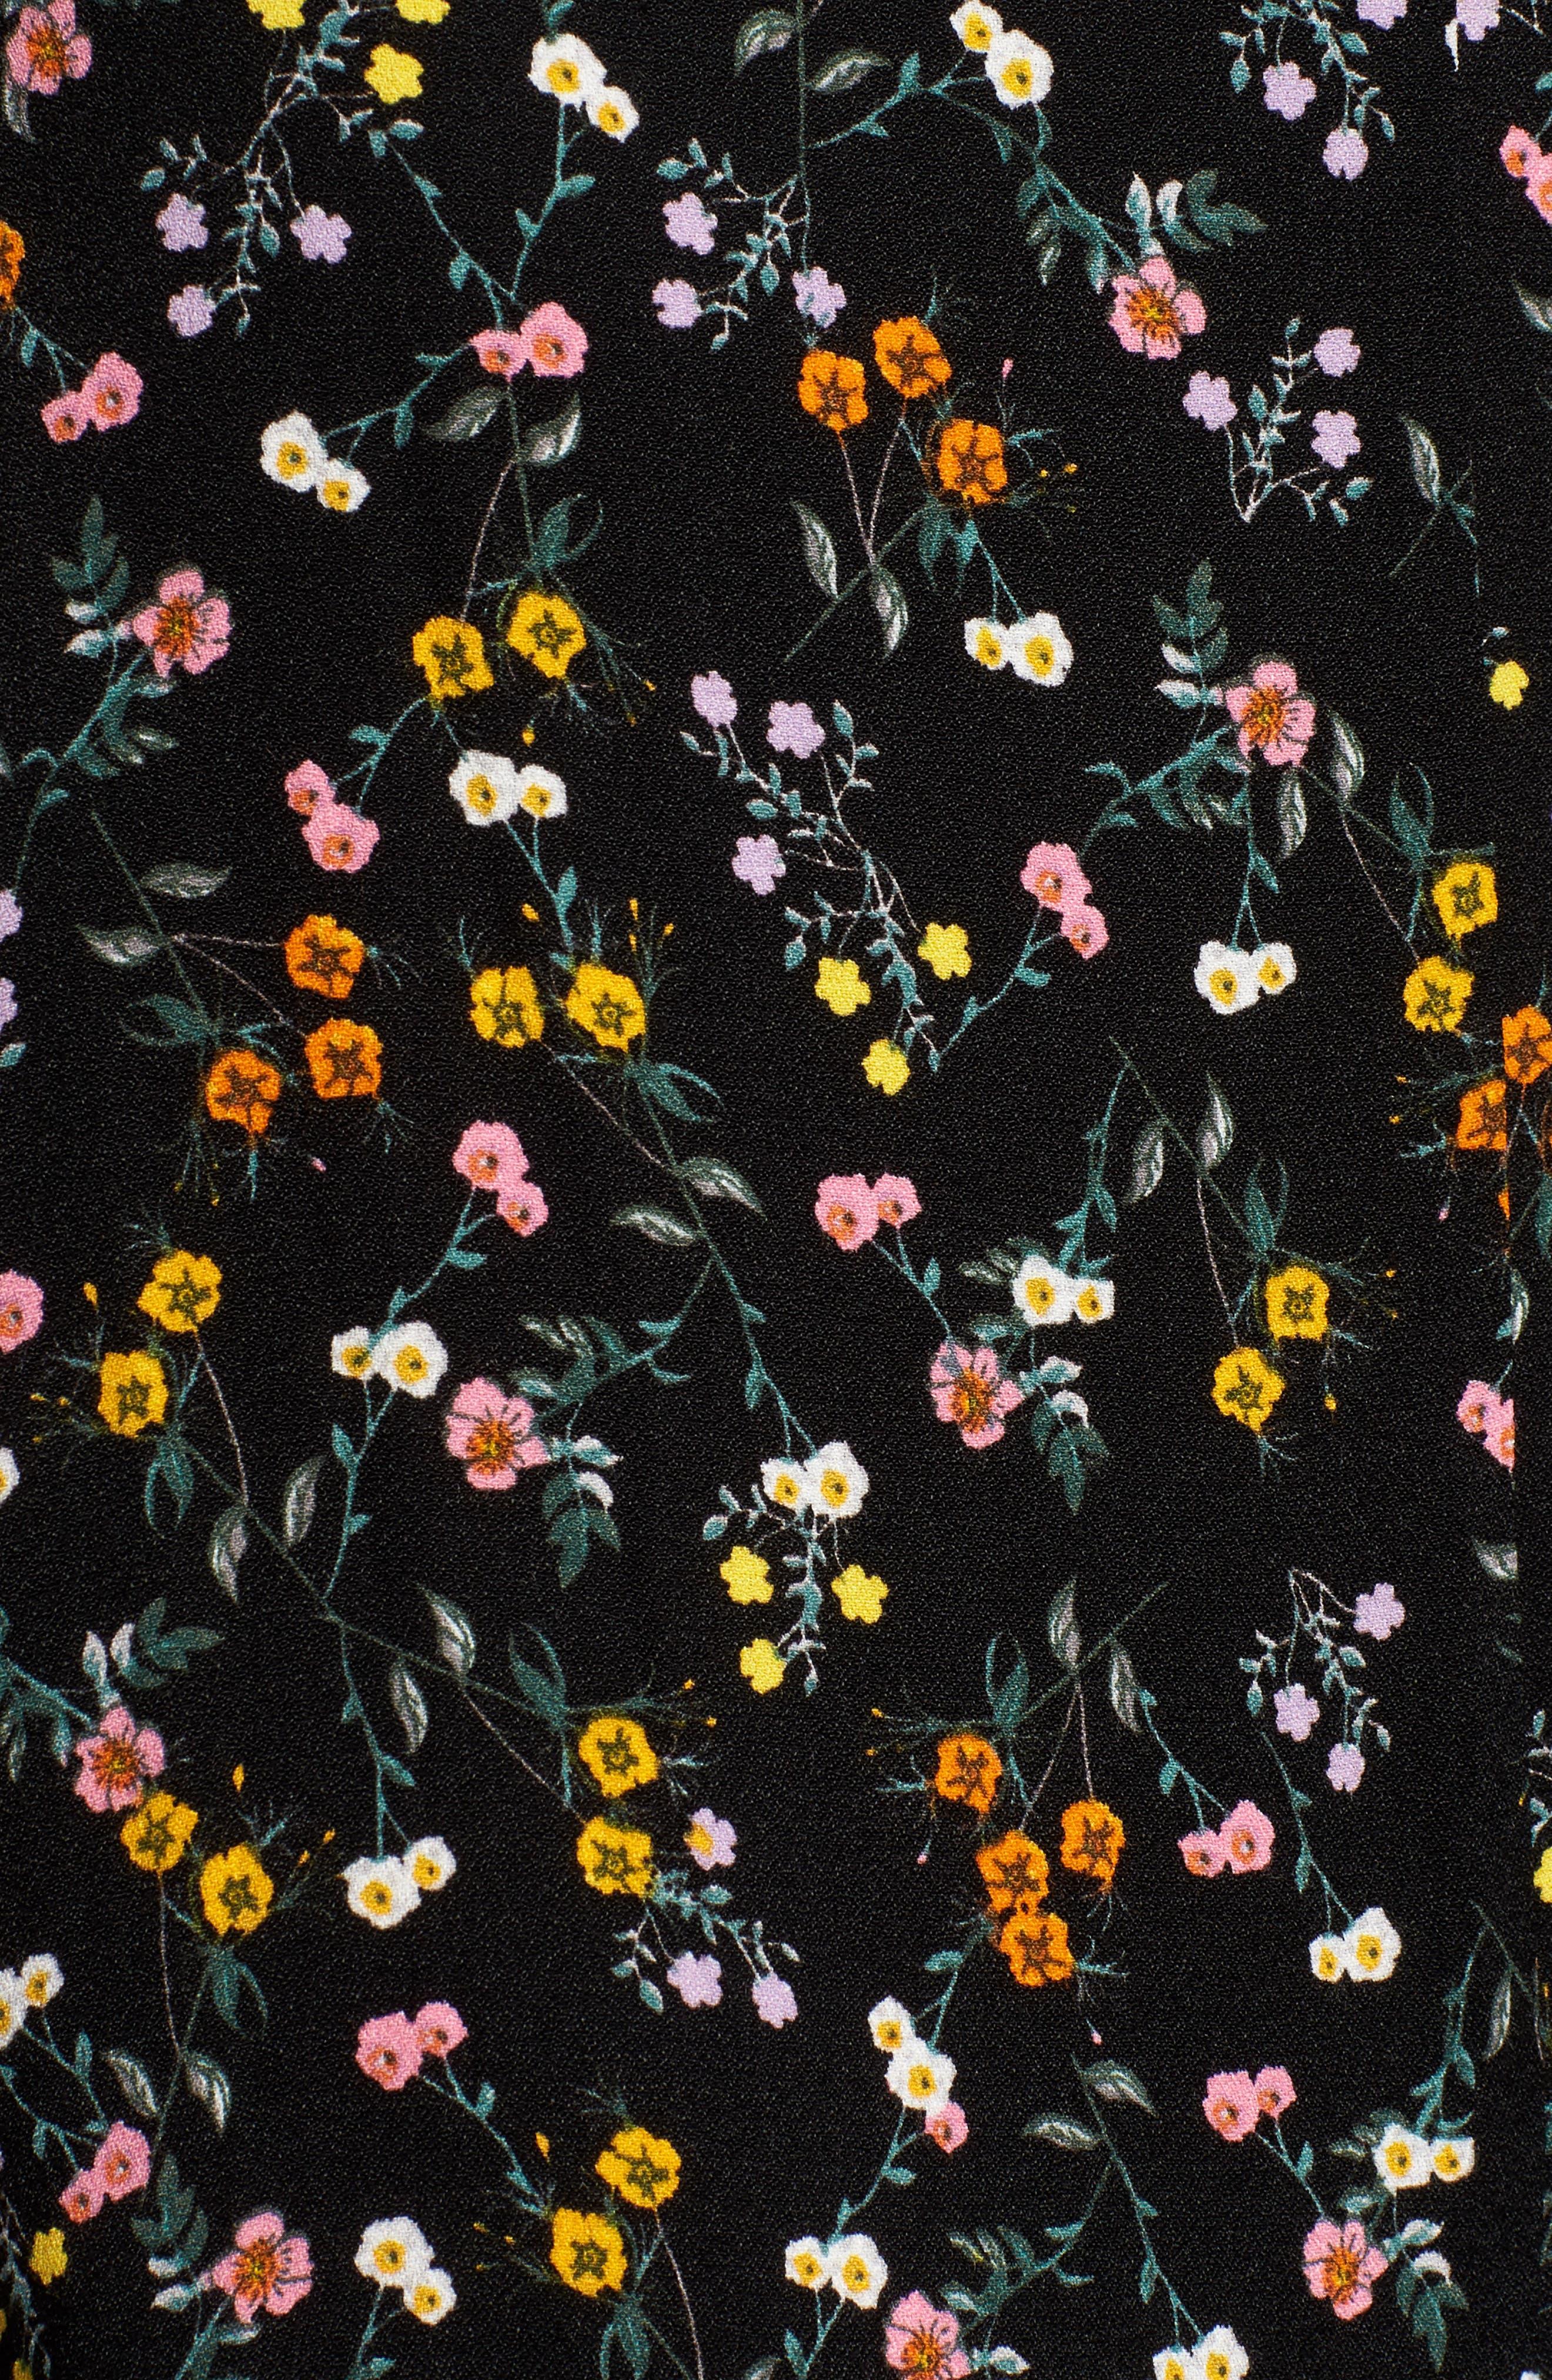 Alessandra Maxi Skirt,                             Alternate thumbnail 5, color,                             Noir Petite Fleur